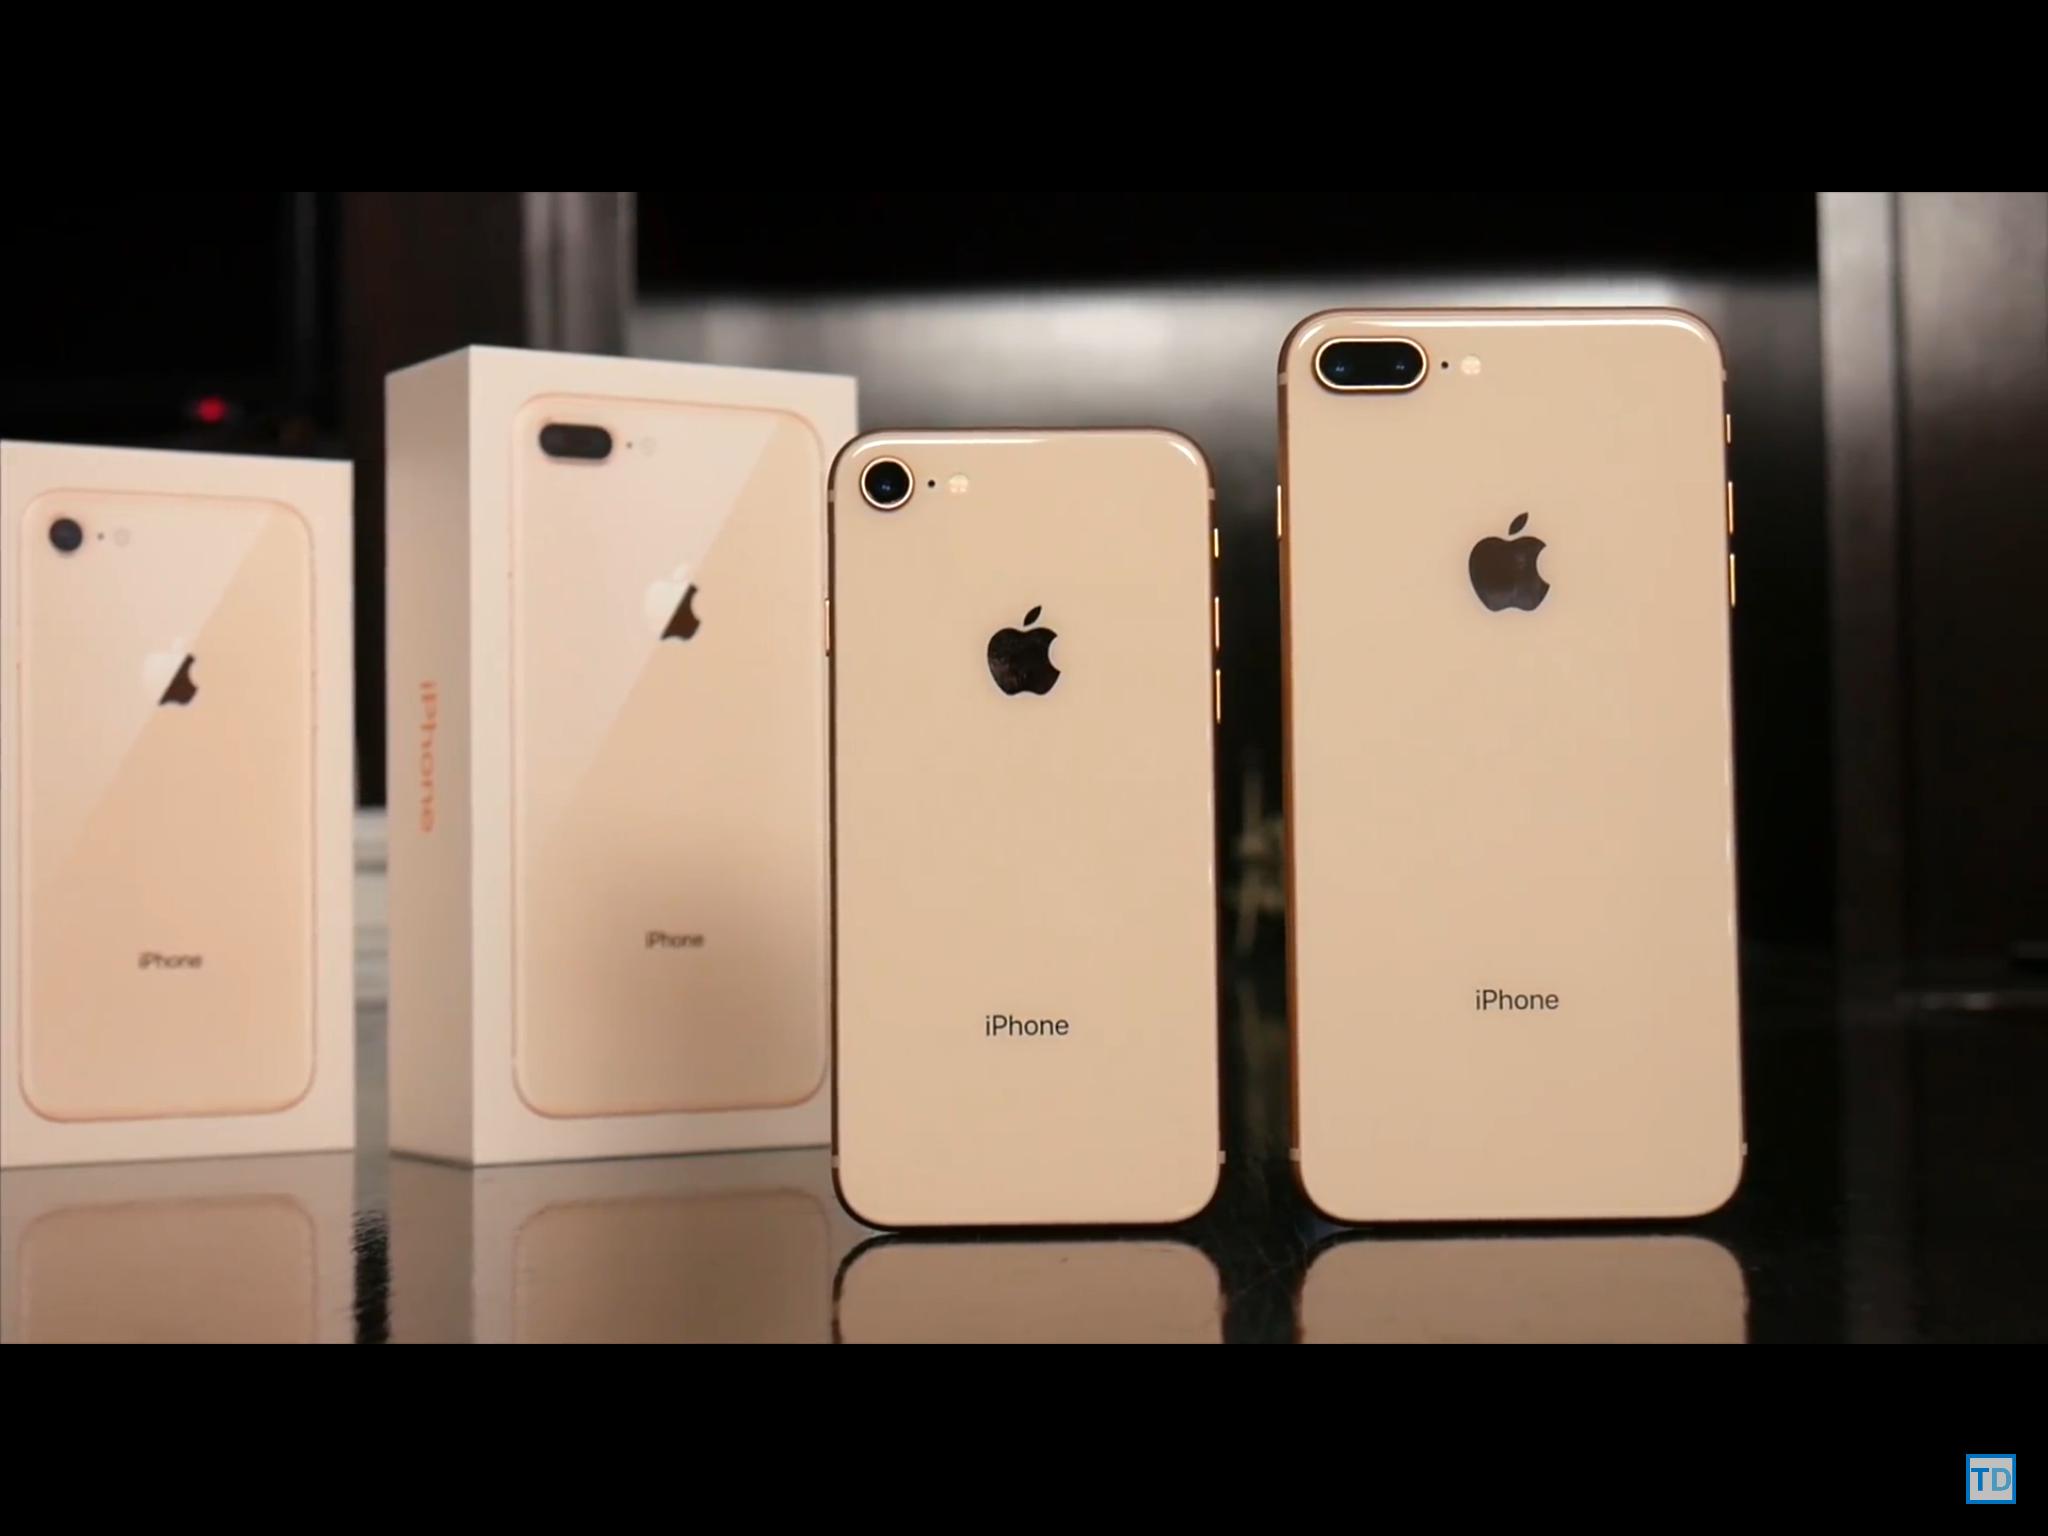 iphone 8 plus in der farbe gold technik apple smartphone. Black Bedroom Furniture Sets. Home Design Ideas